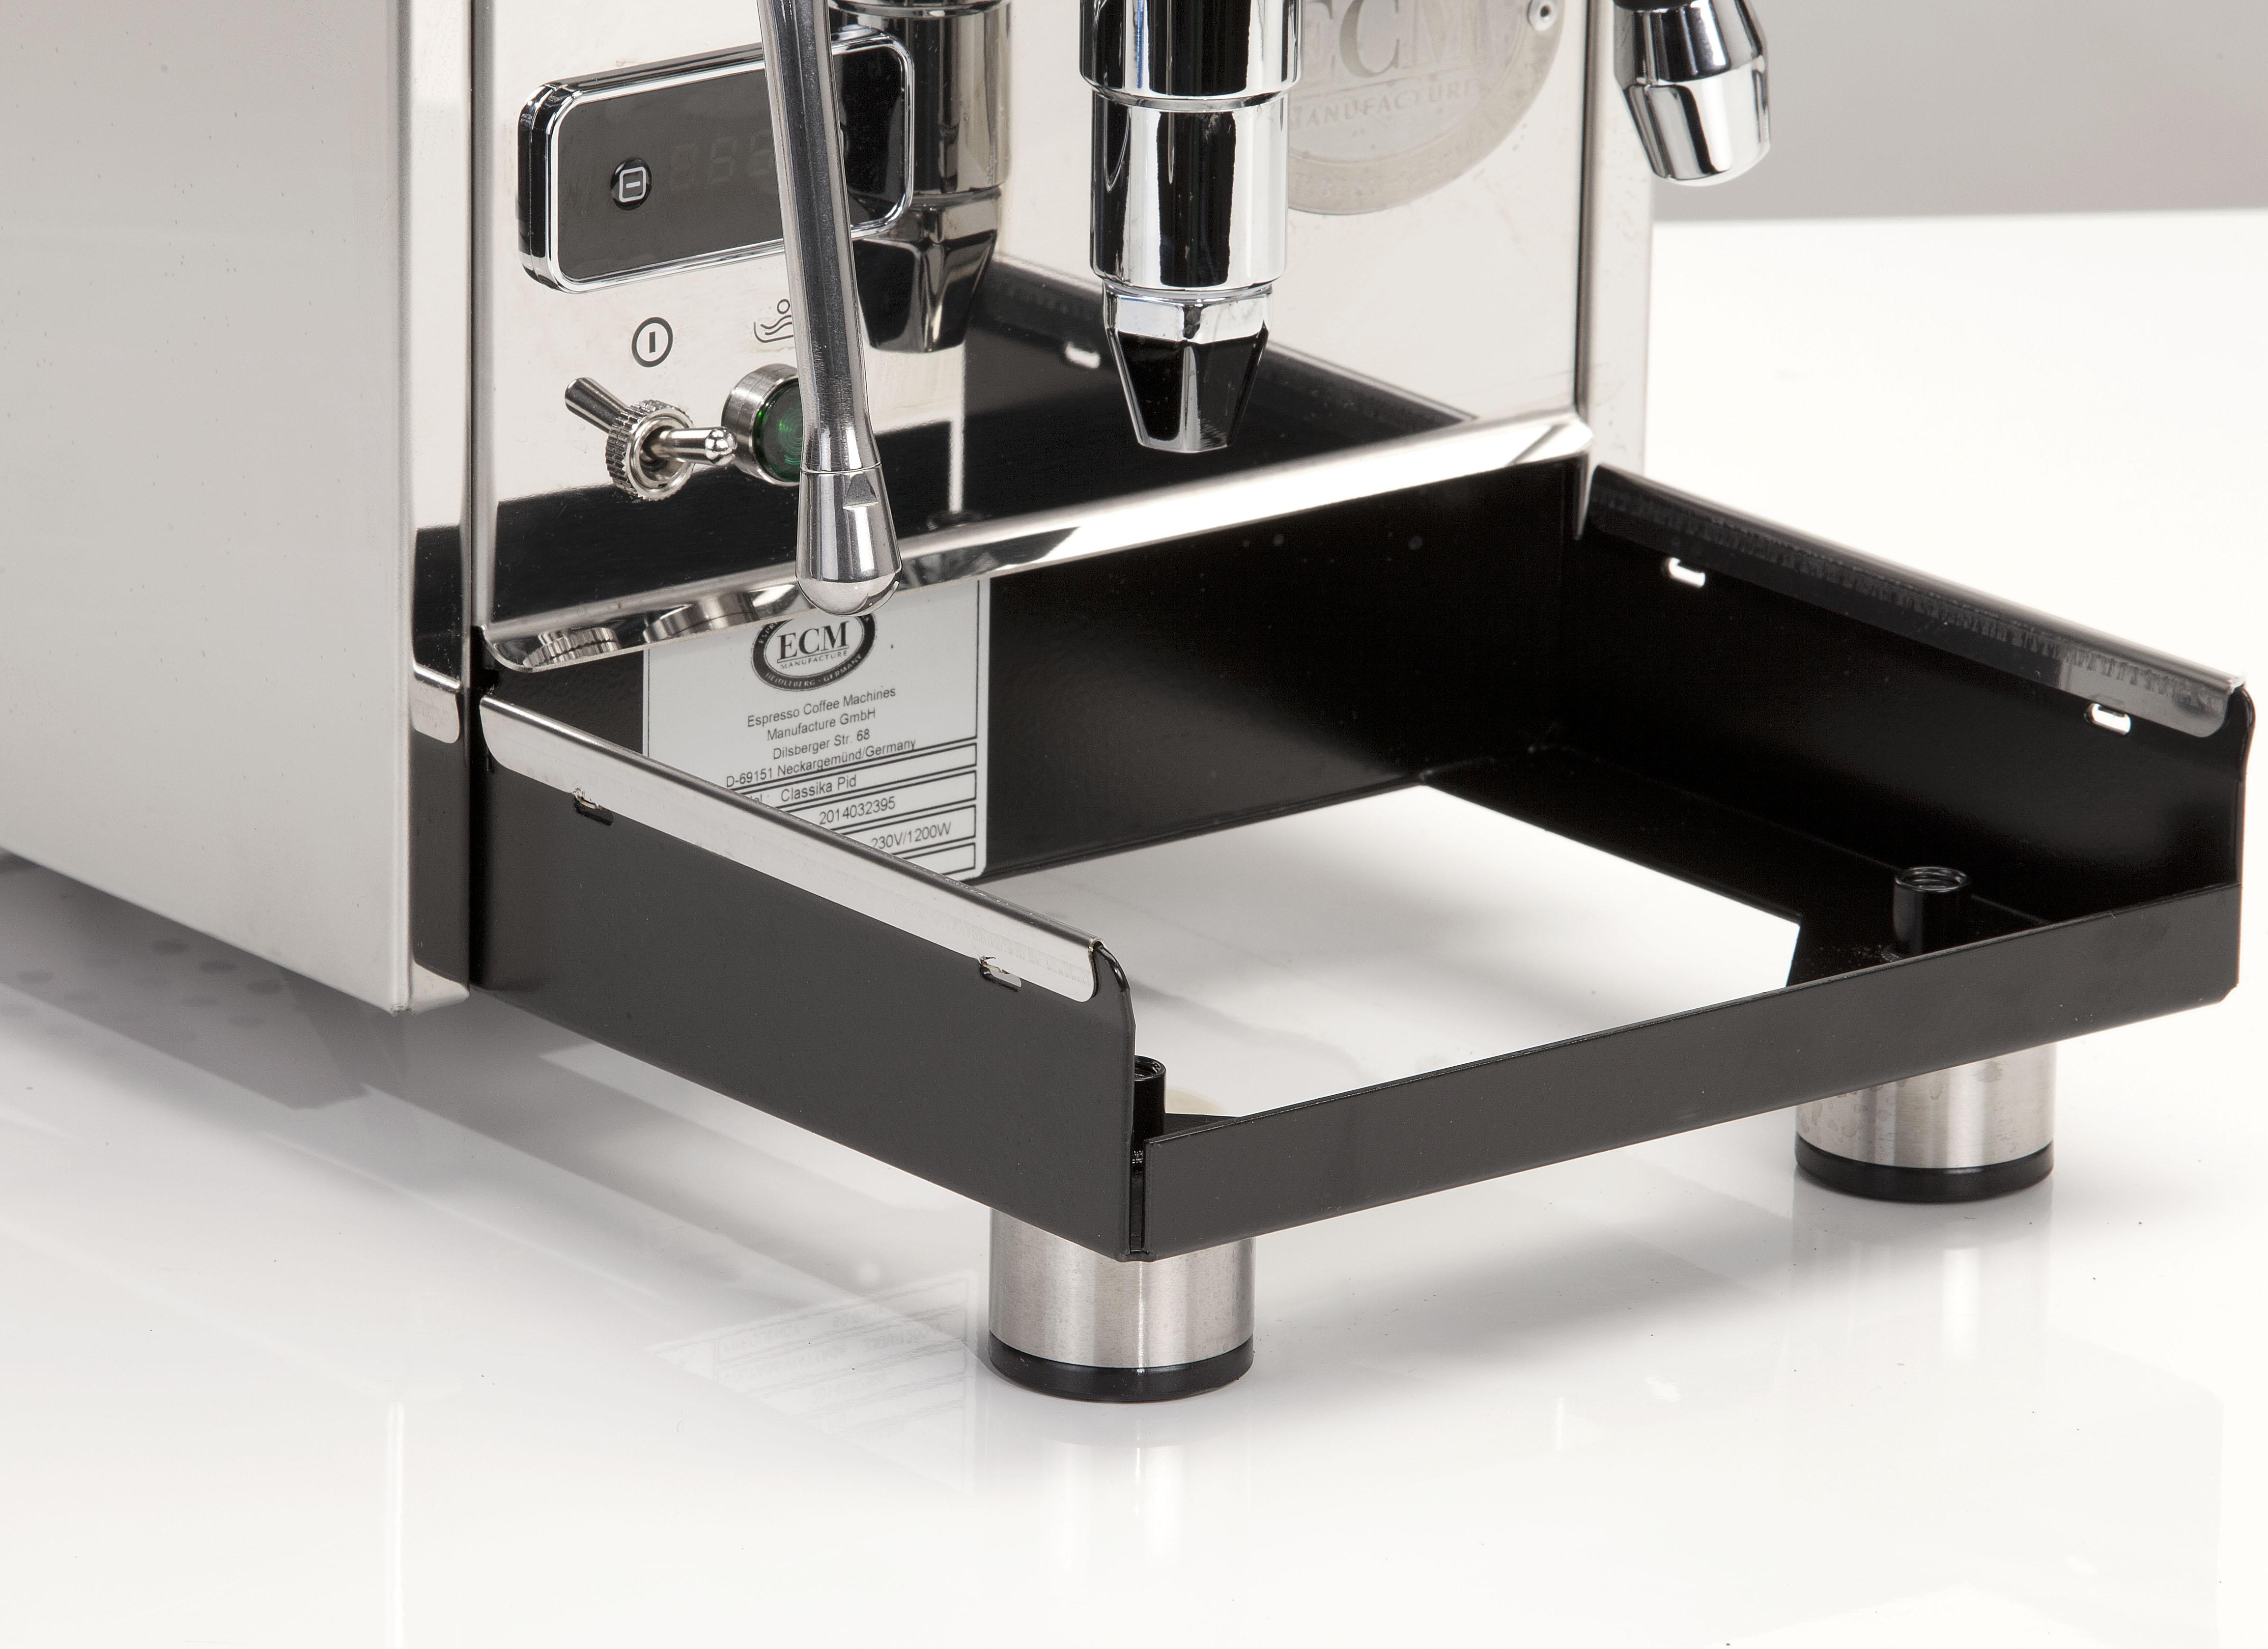 ECM Classika PID - Edelstahl poliert Siebträgermaschine